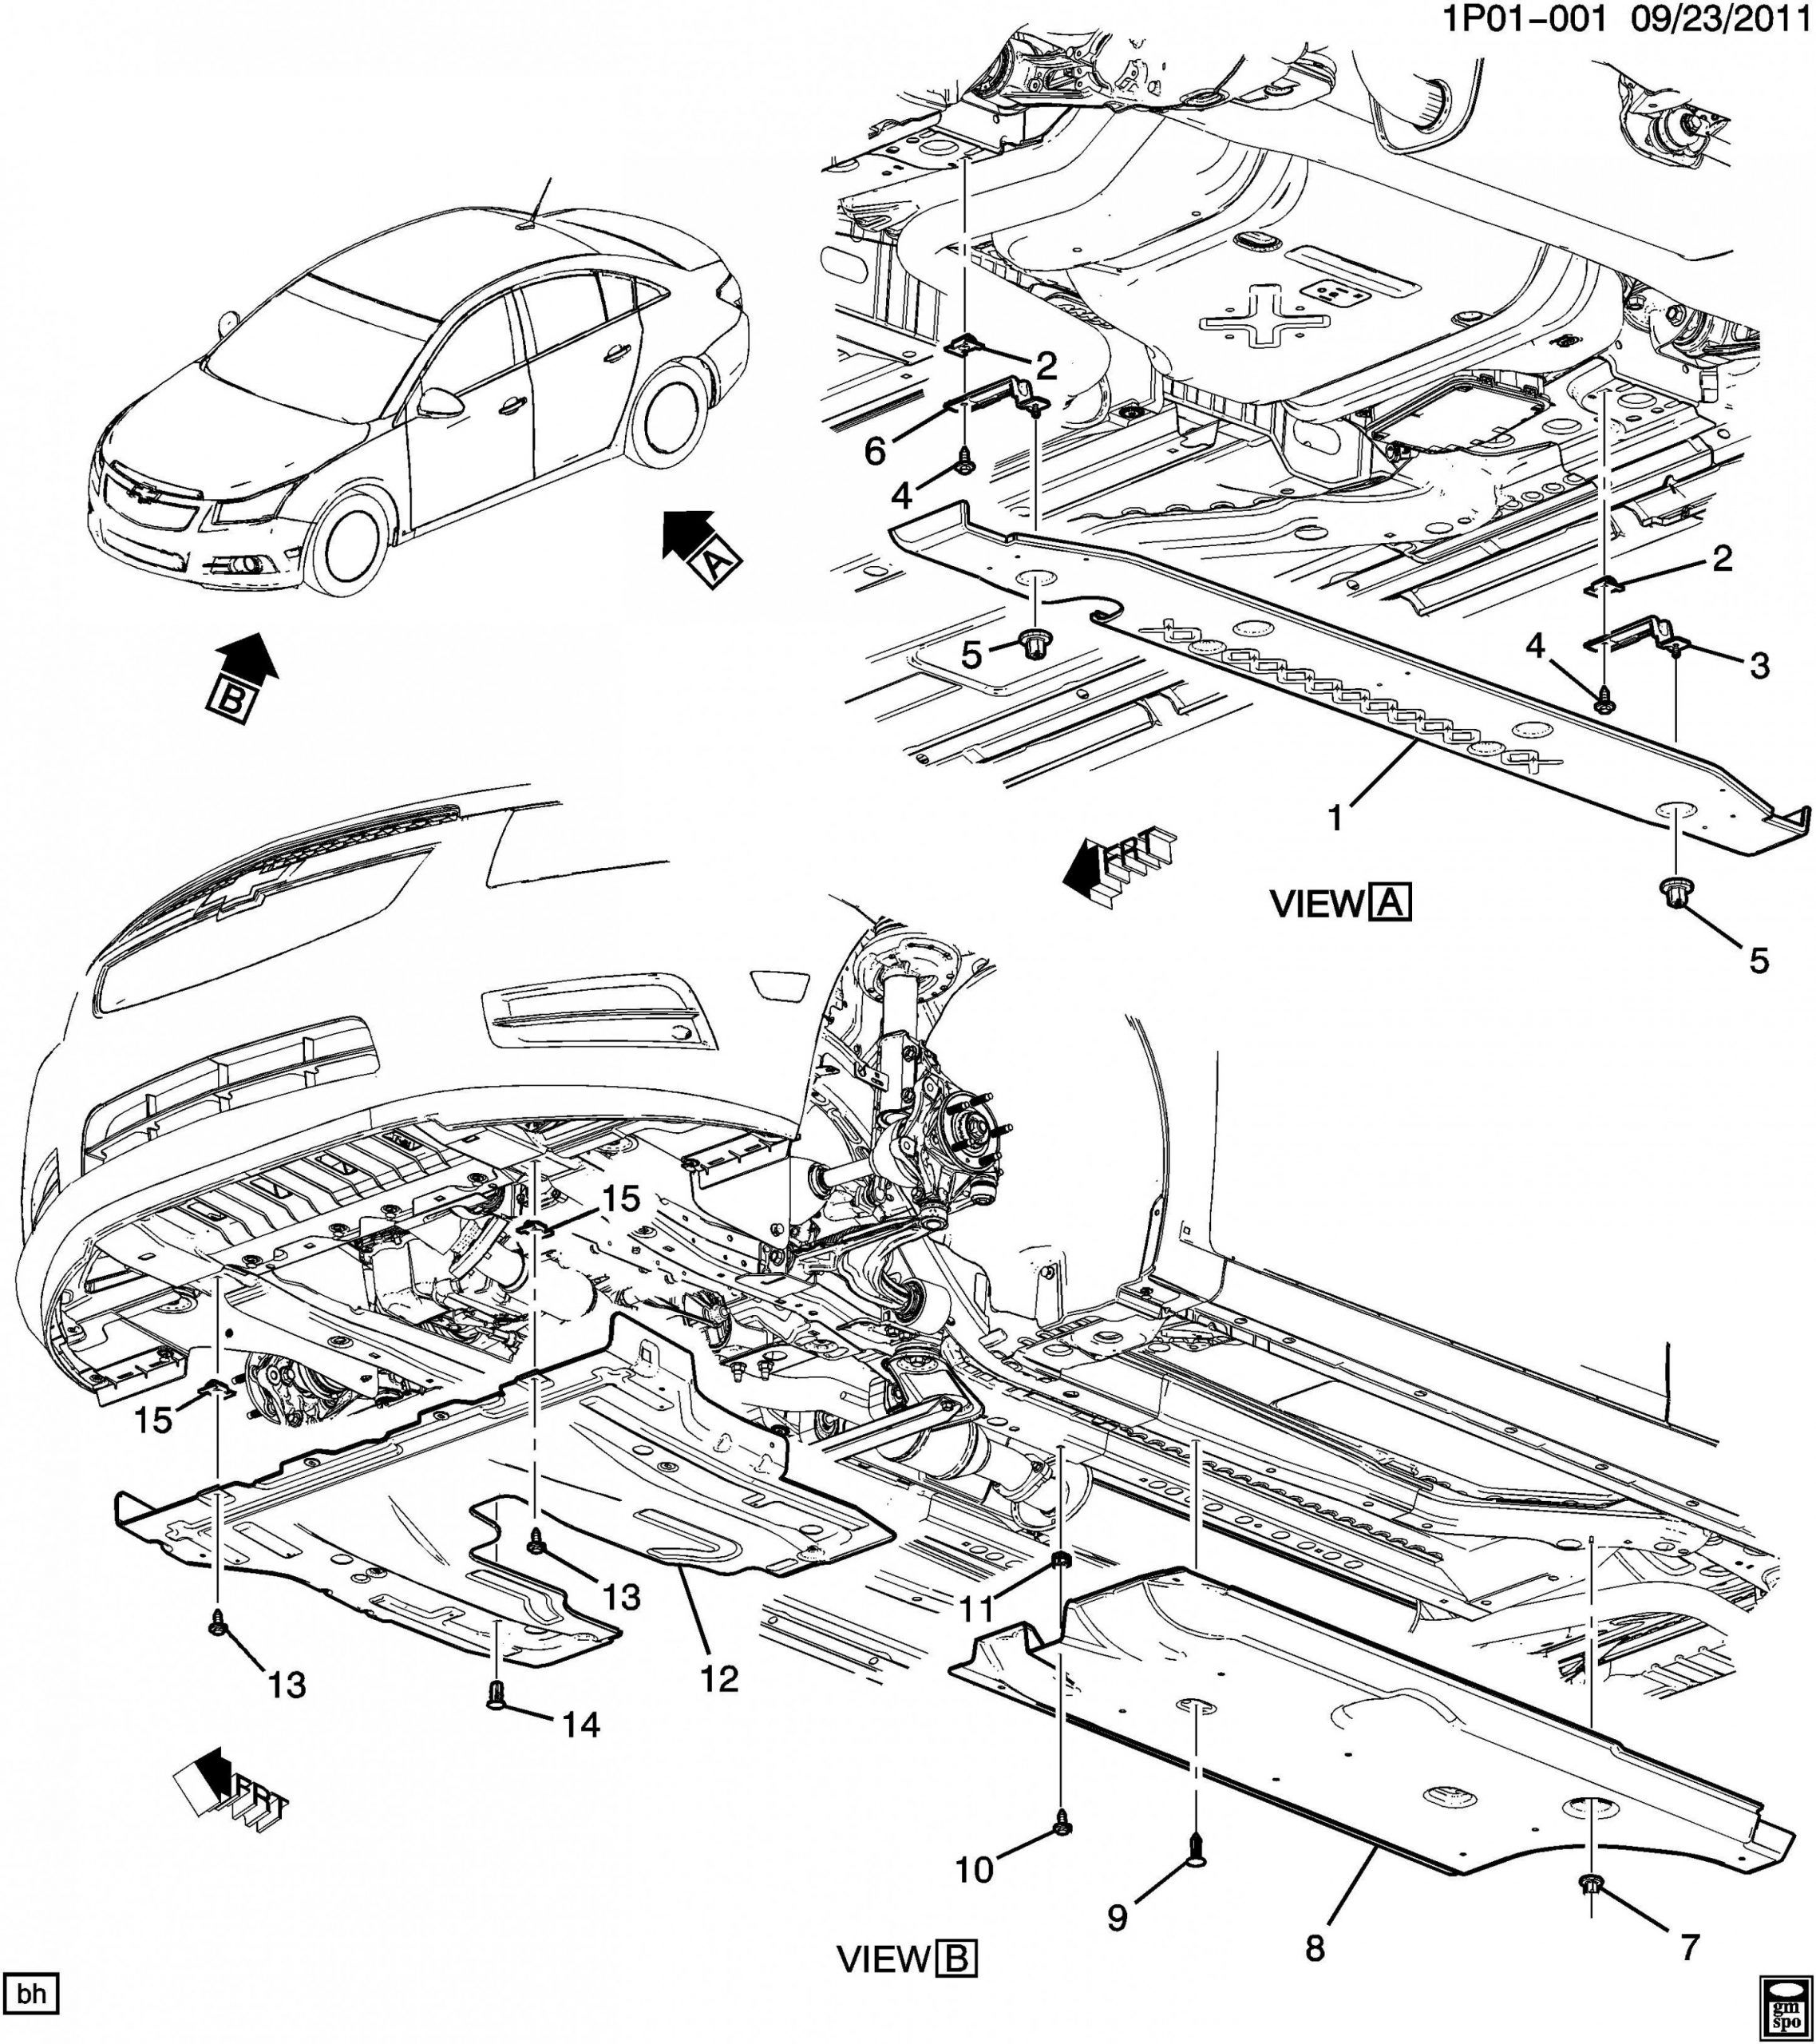 6 Chevy Cruze Engine Parts Diagram Di